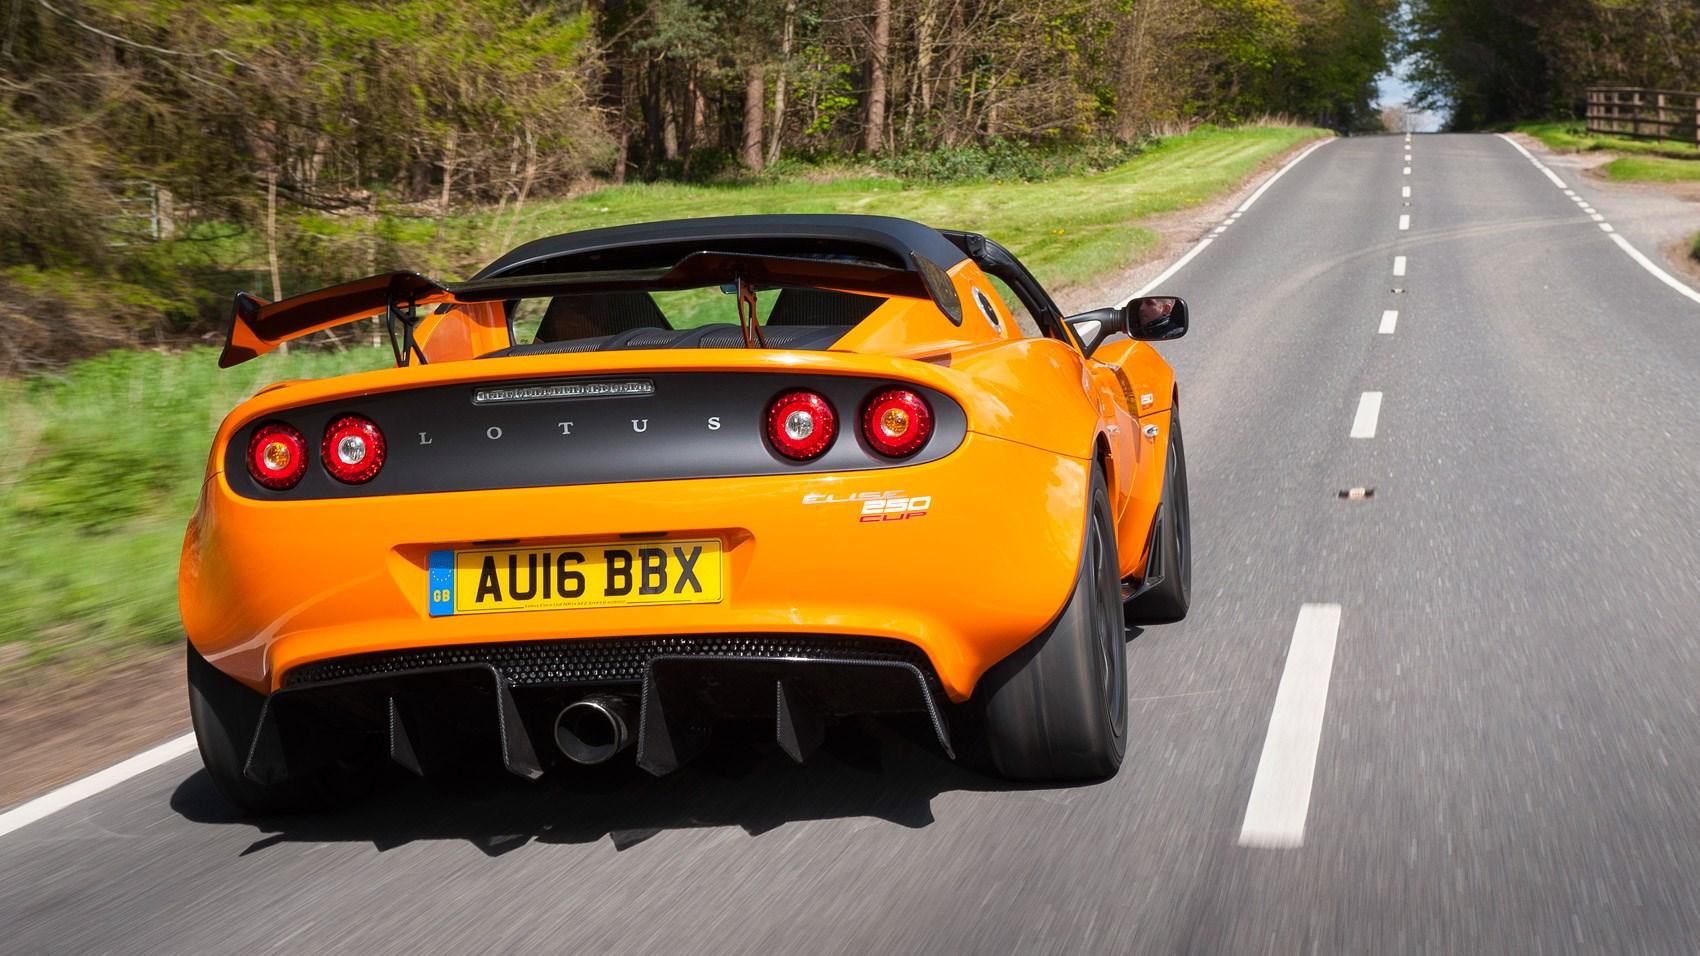 2016 Lotus Exige Sport 350 - lotus cars - YouTube